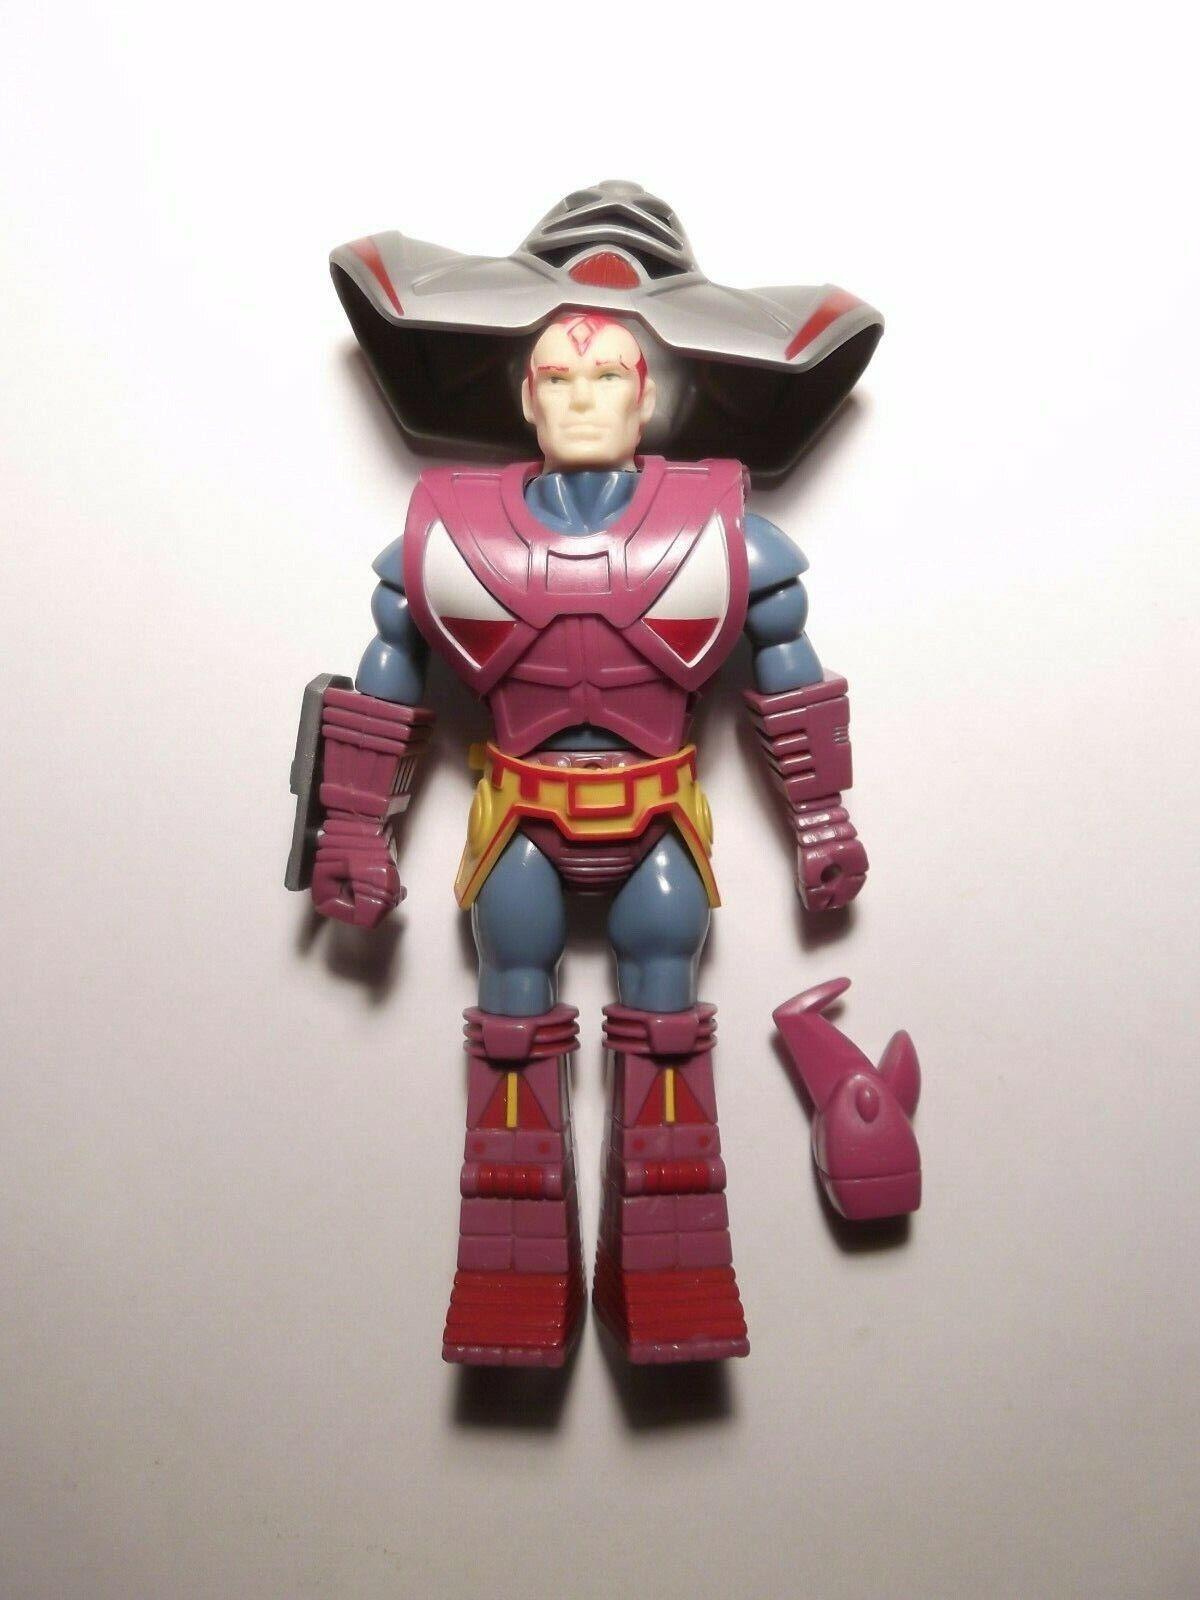 Acamas  giocattoli X-Changers Lt. Stern cifra completare galaxy warriors ko rare  vendita all'ingrosso